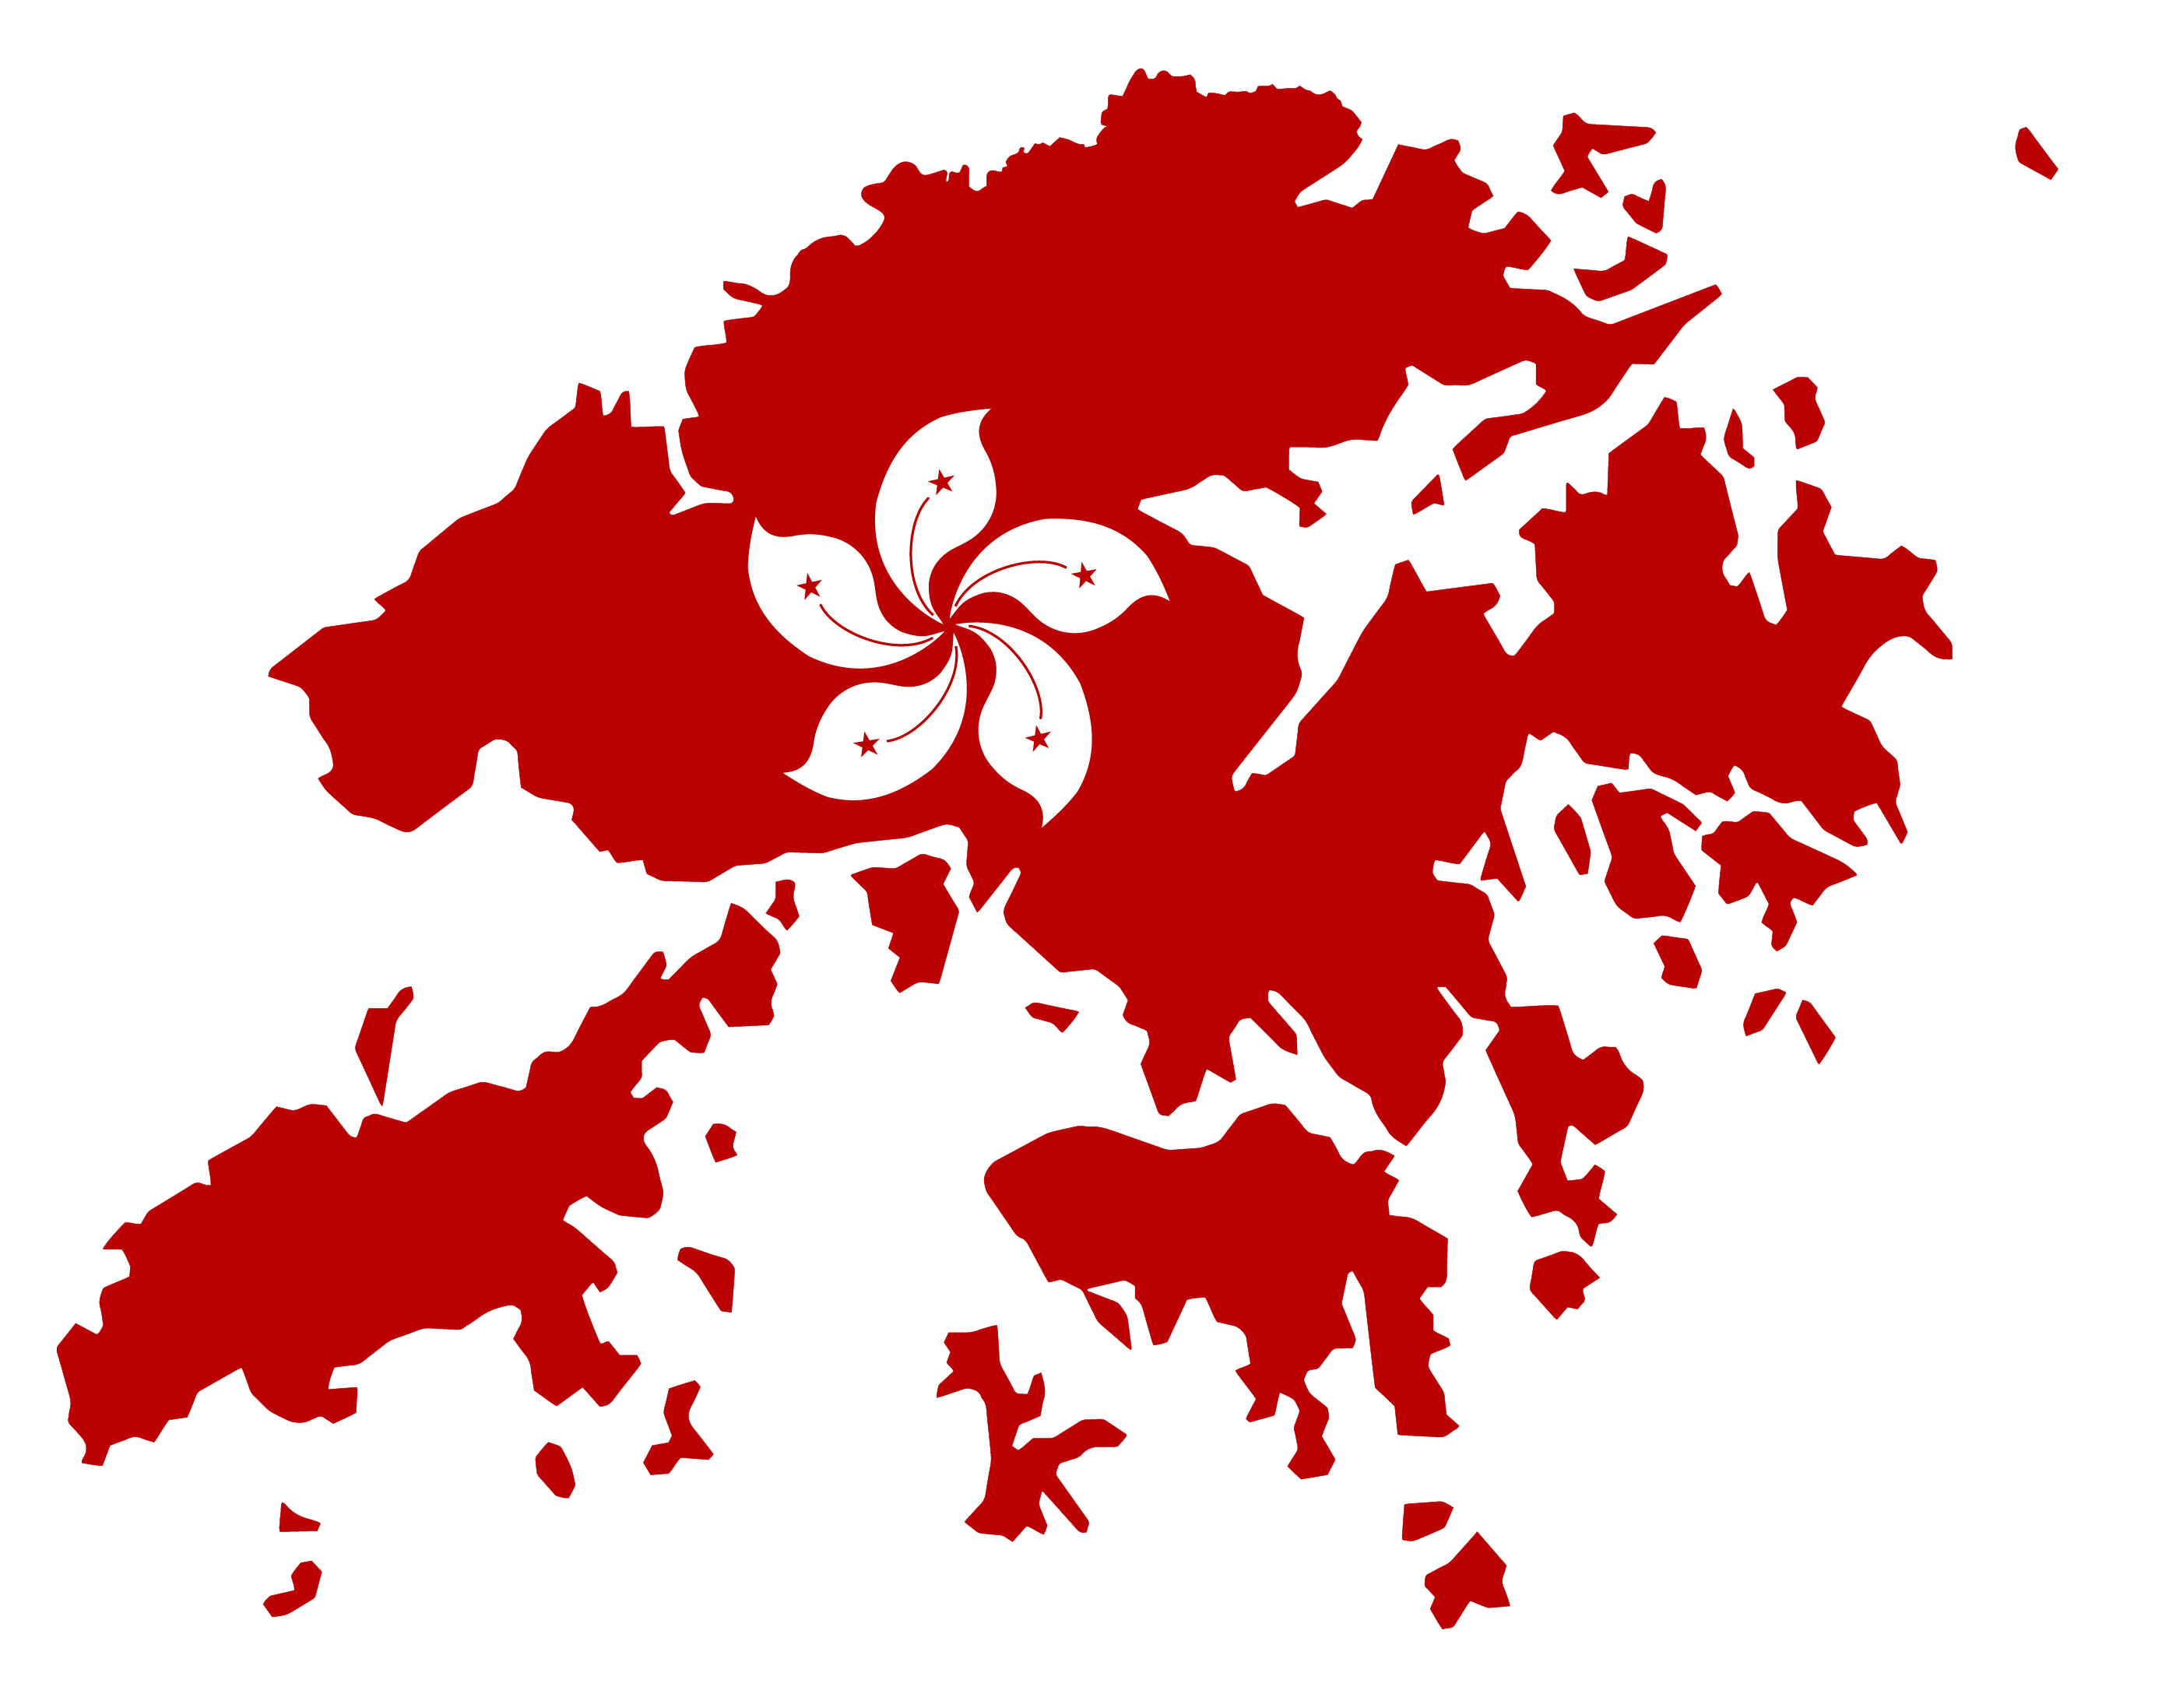 Map of Hong Kong with flag overlay